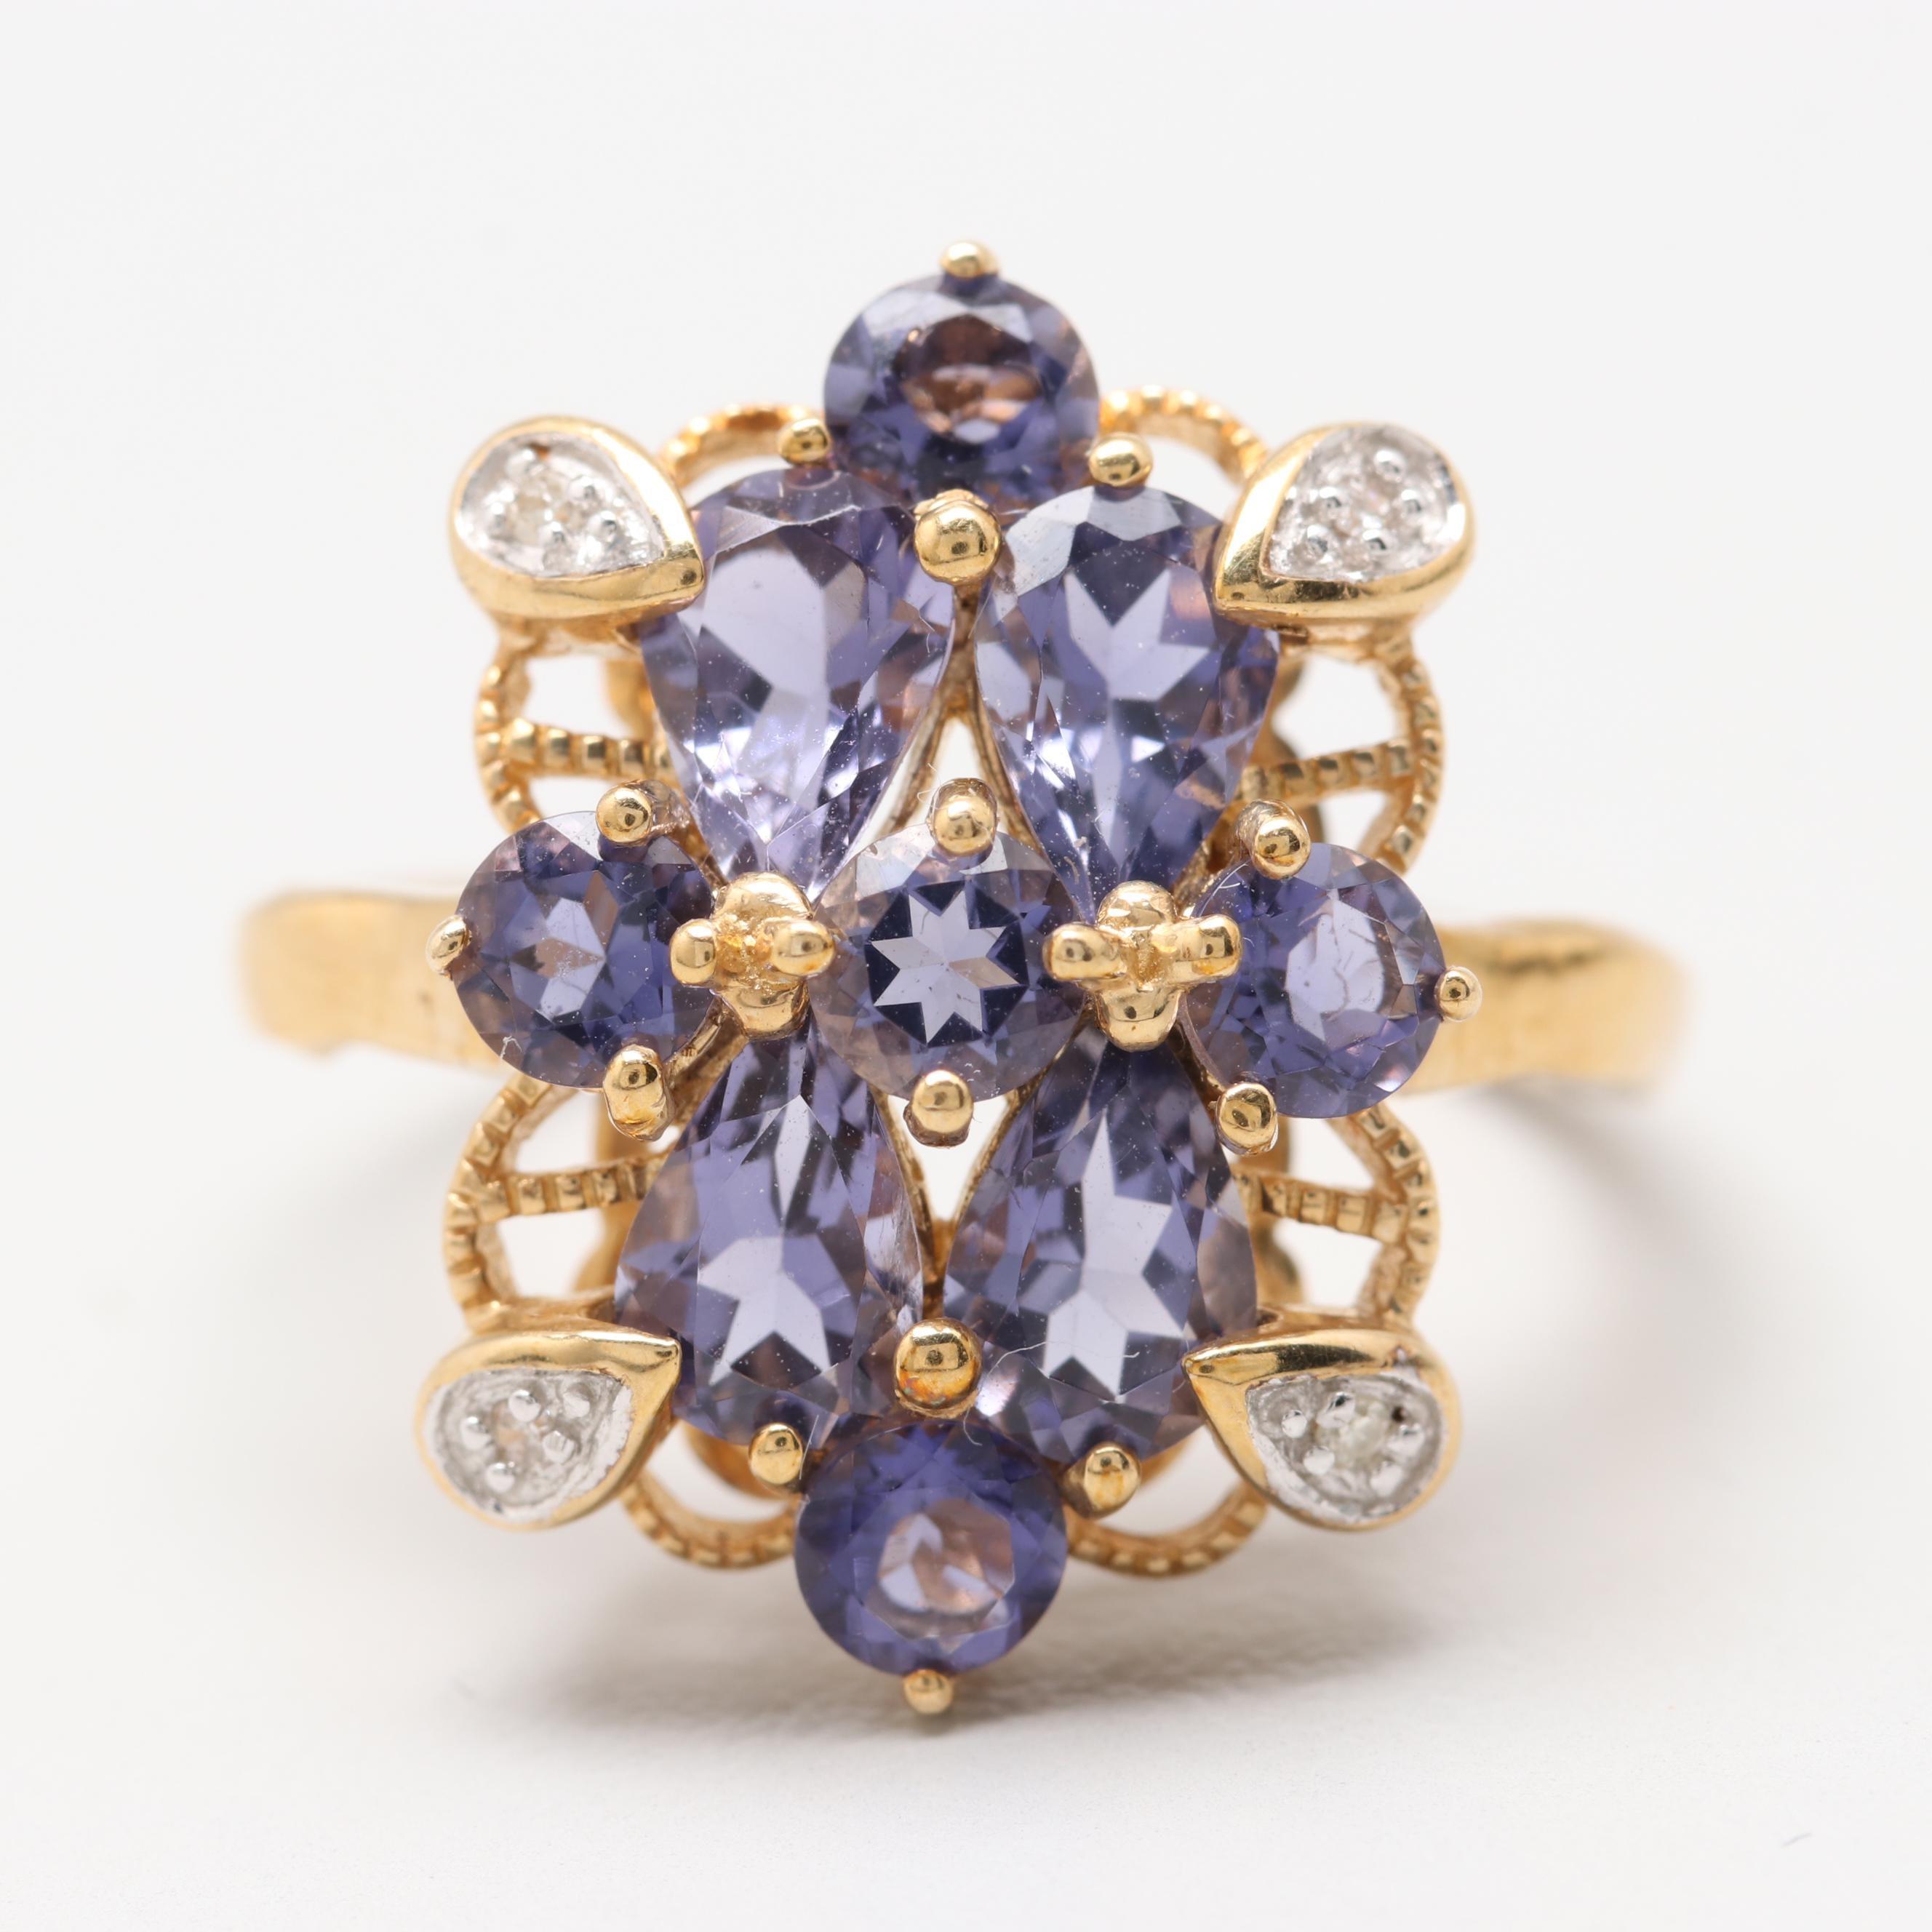 10K Yellow Gold Iolite and Diamond Ring